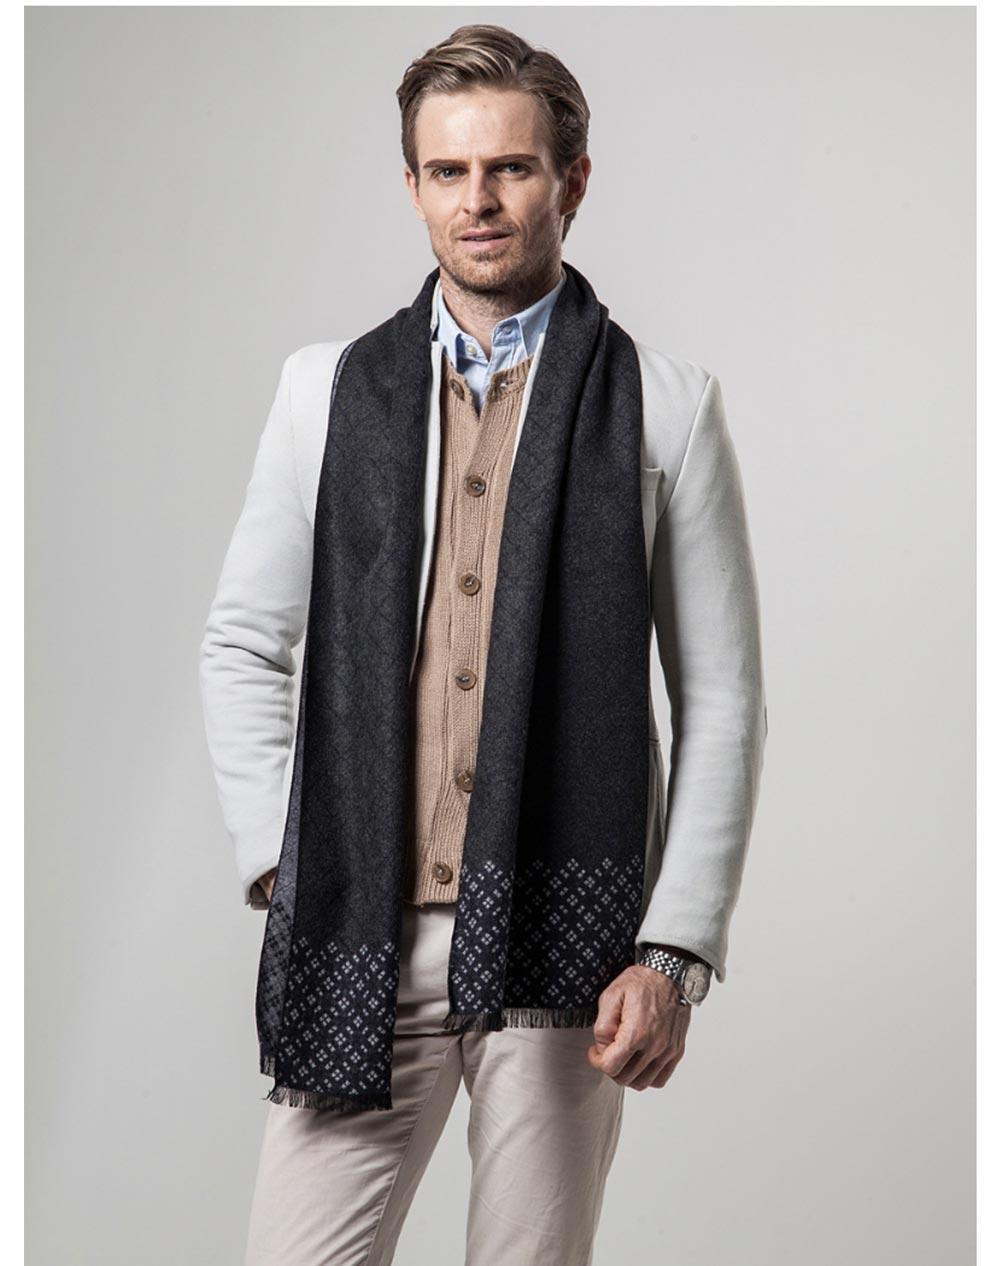 British Style Plaid Scarf for Men, Business Man, Gentleman, Unique Imitation Cashmere Plaid scarf, 2019 Brand New Men's Scarf 16